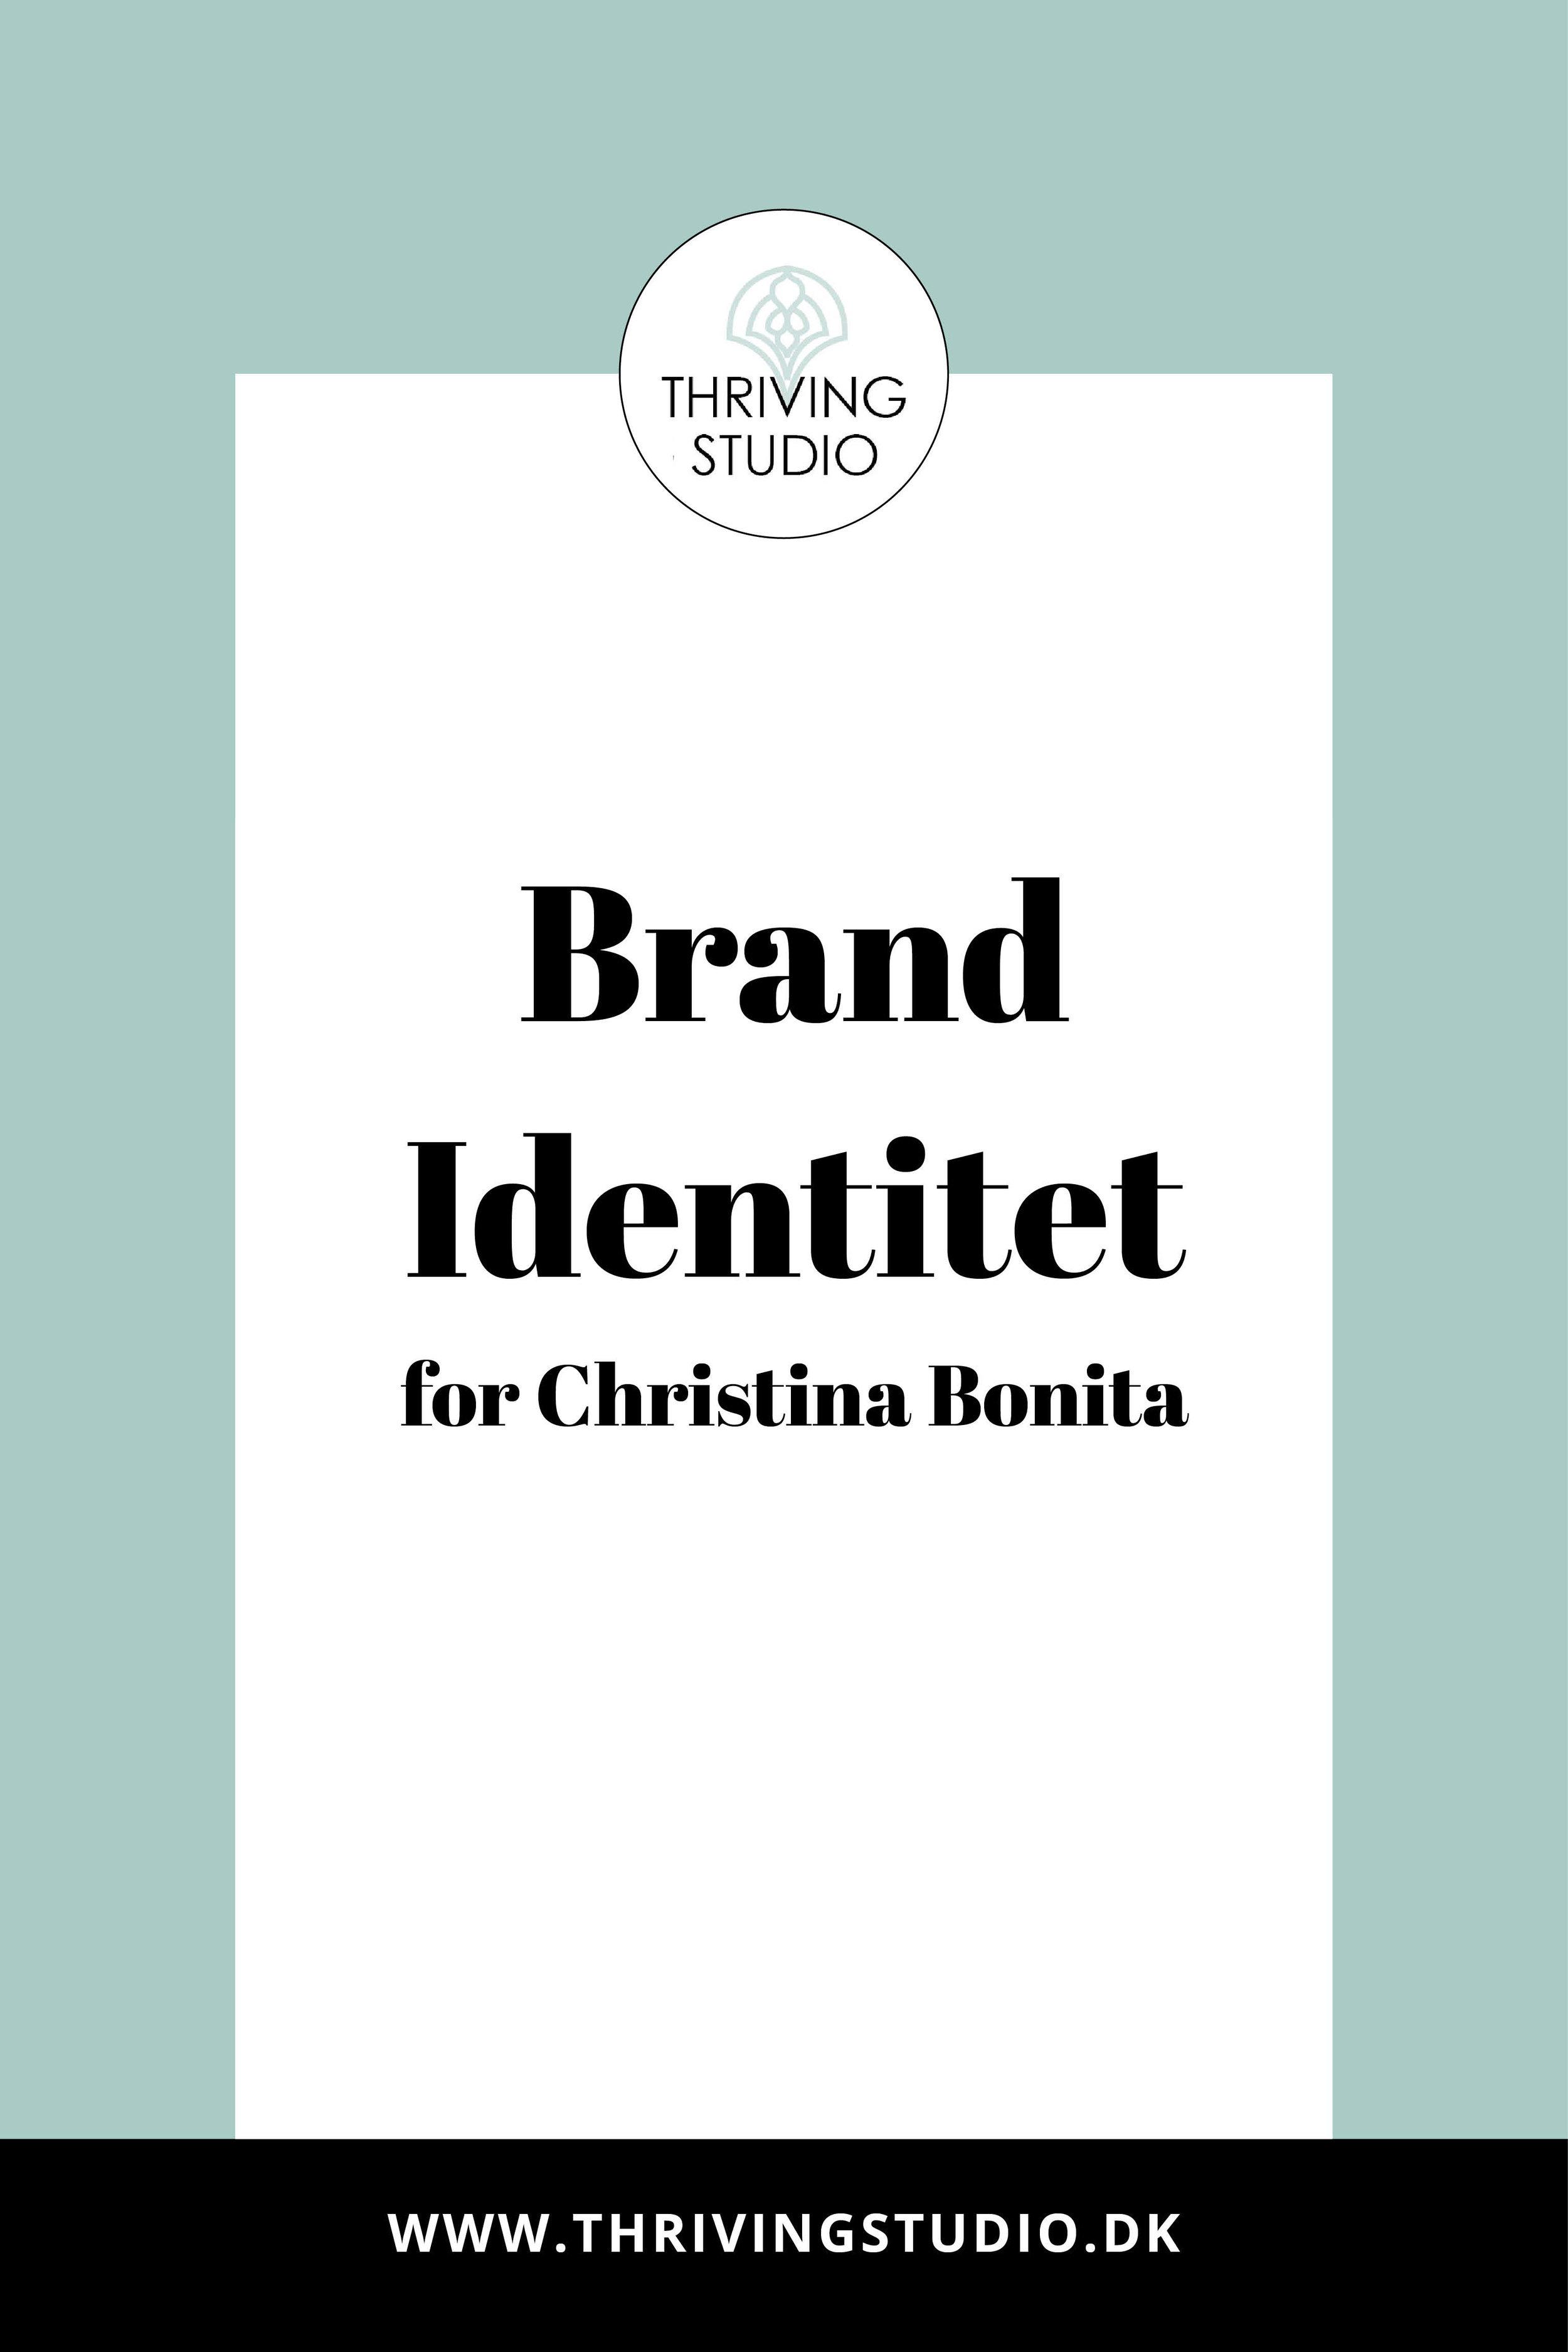 portefolje-brand-identitet-christina-bonita.jpg